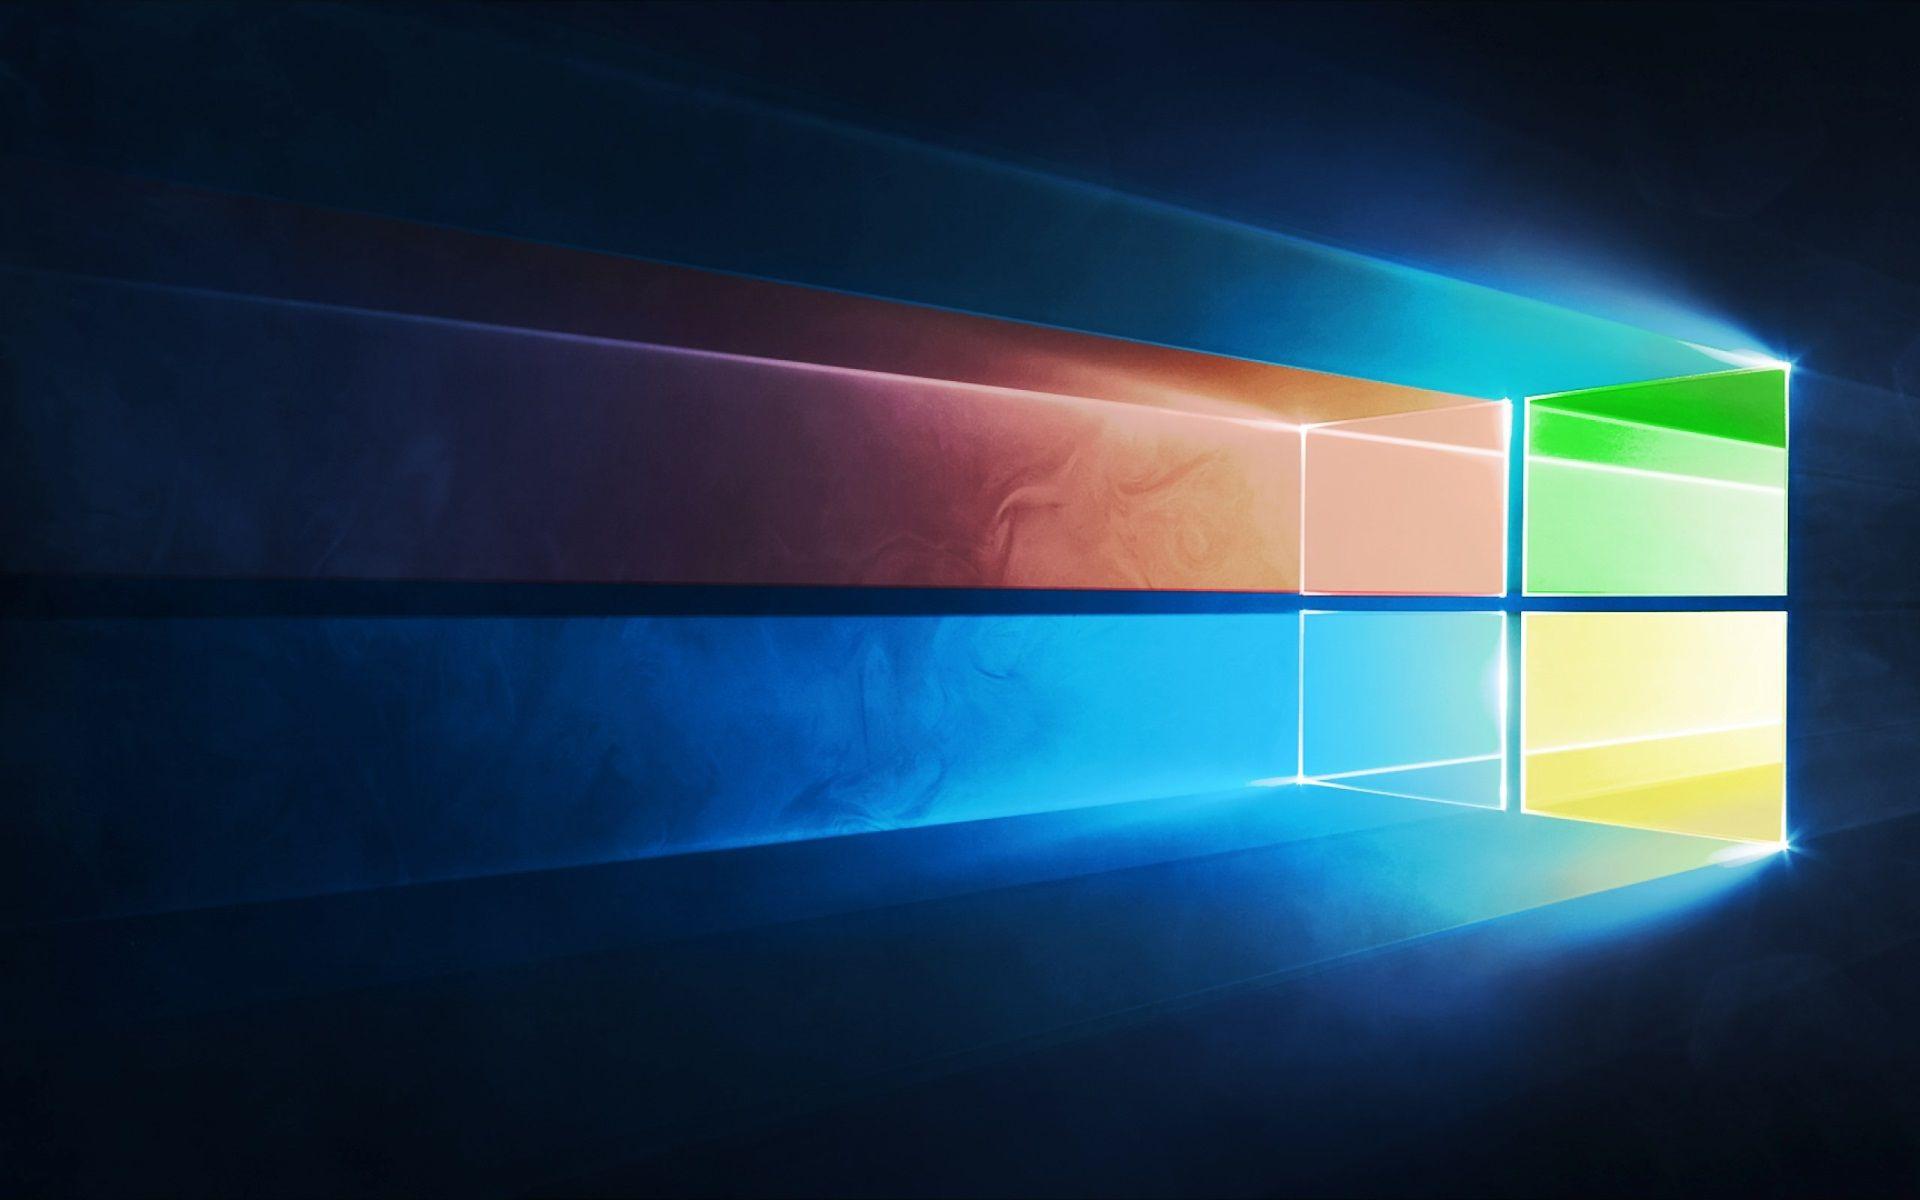 1920x1200 Microsoft Windows Hd Free Wallpaper Microsoft Wallpaper Windows Wallpaper Wallpaper Windows 10